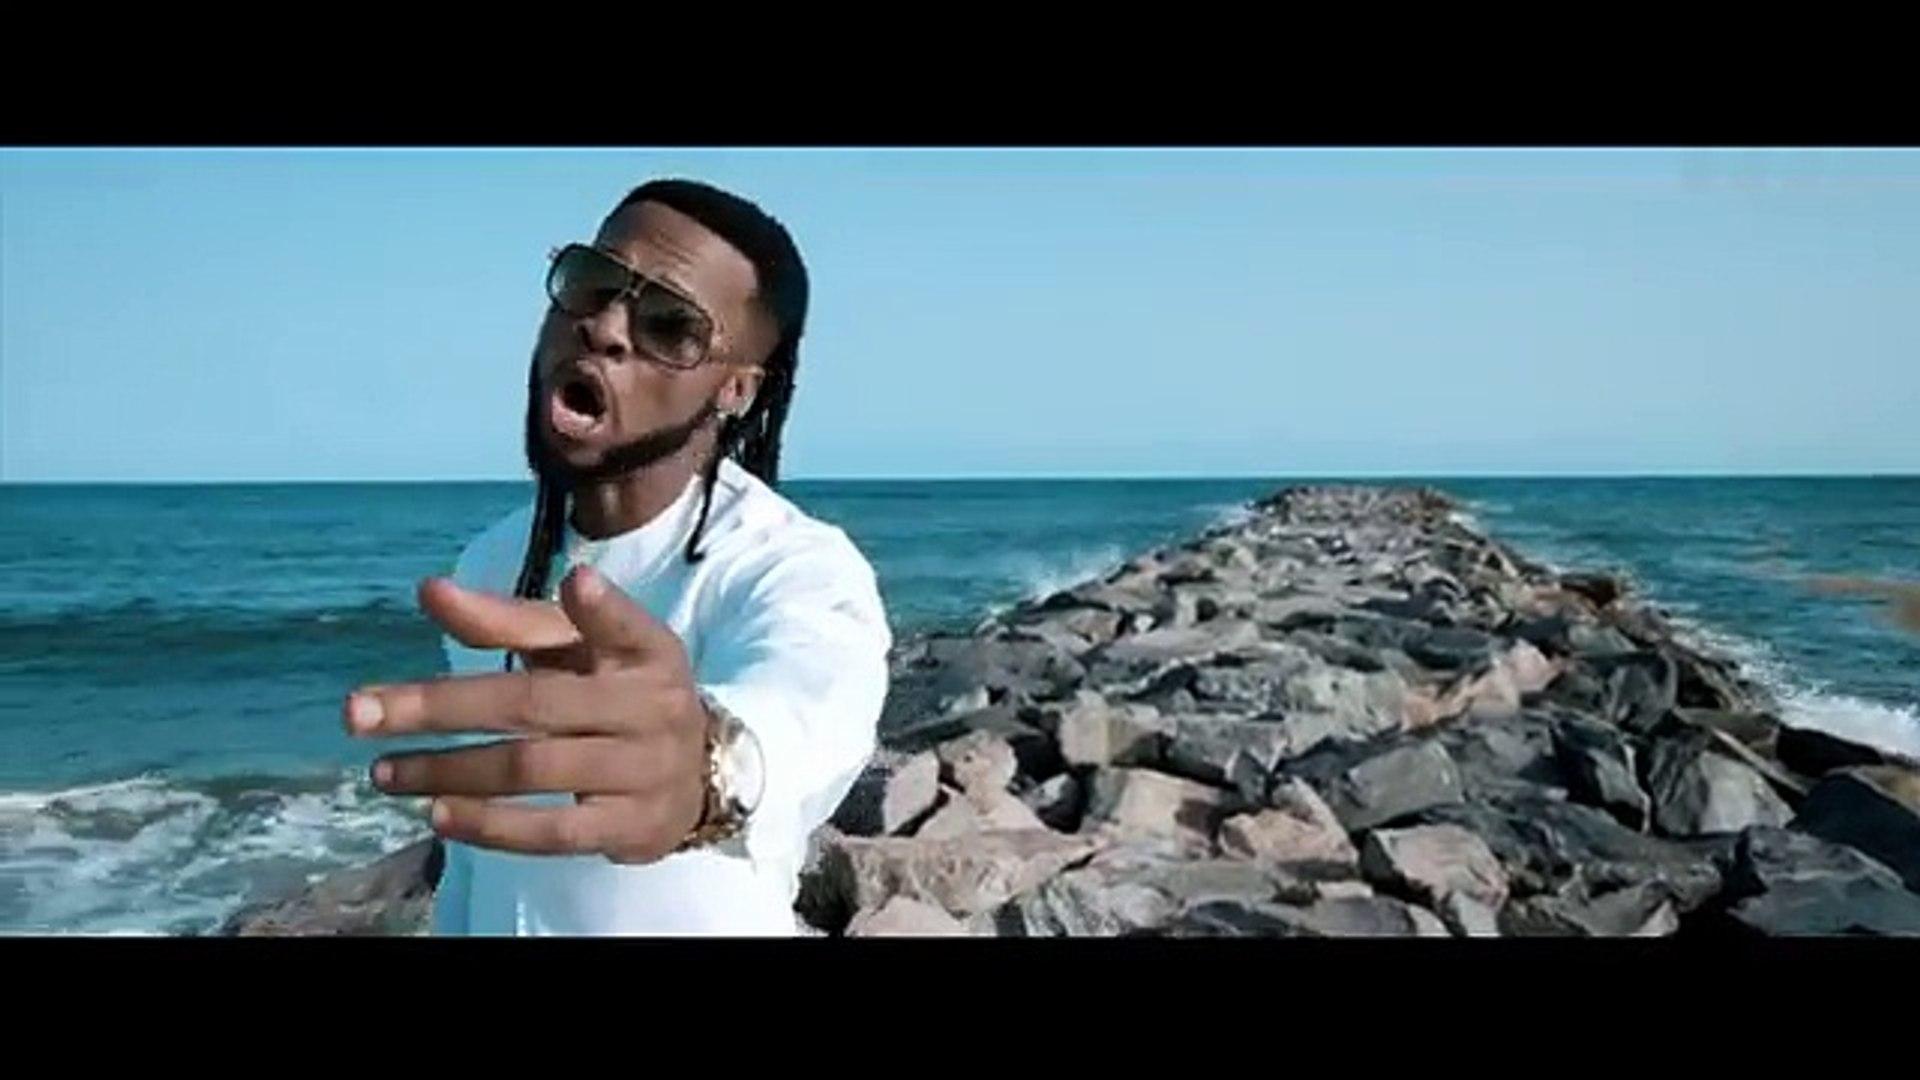 Flavour - Most High (feat  Semah G  Weifur) [Official Video]